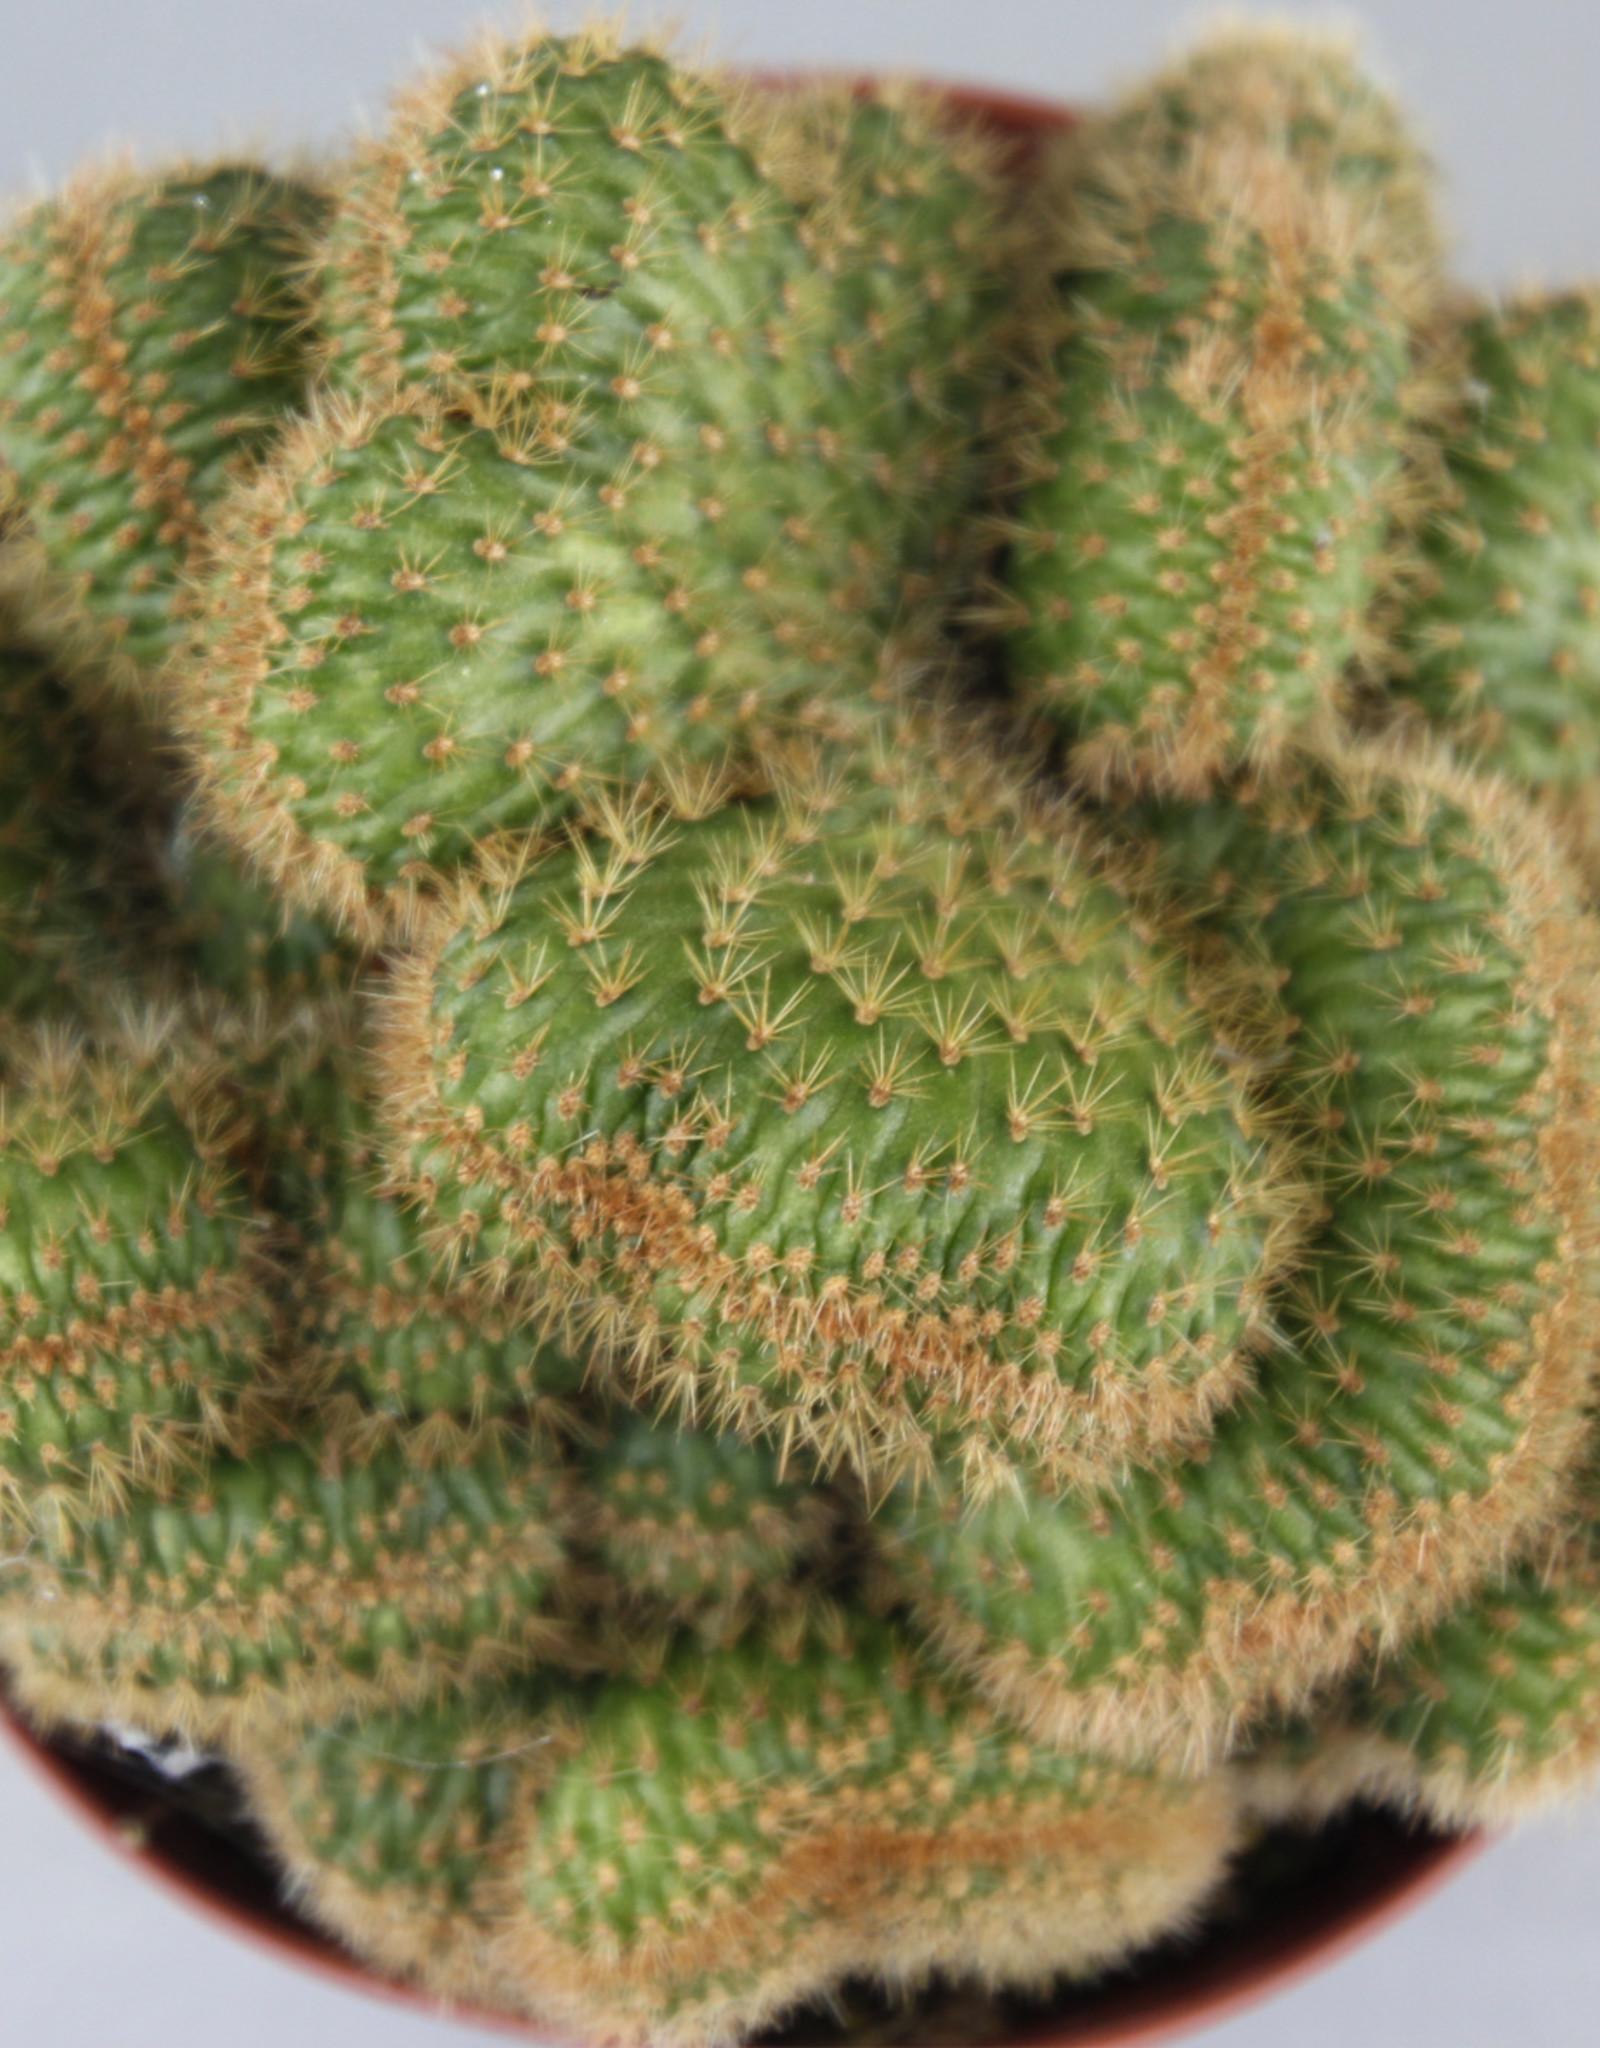 Hildewintera aureispina cristata - Hersenkoraal cactus